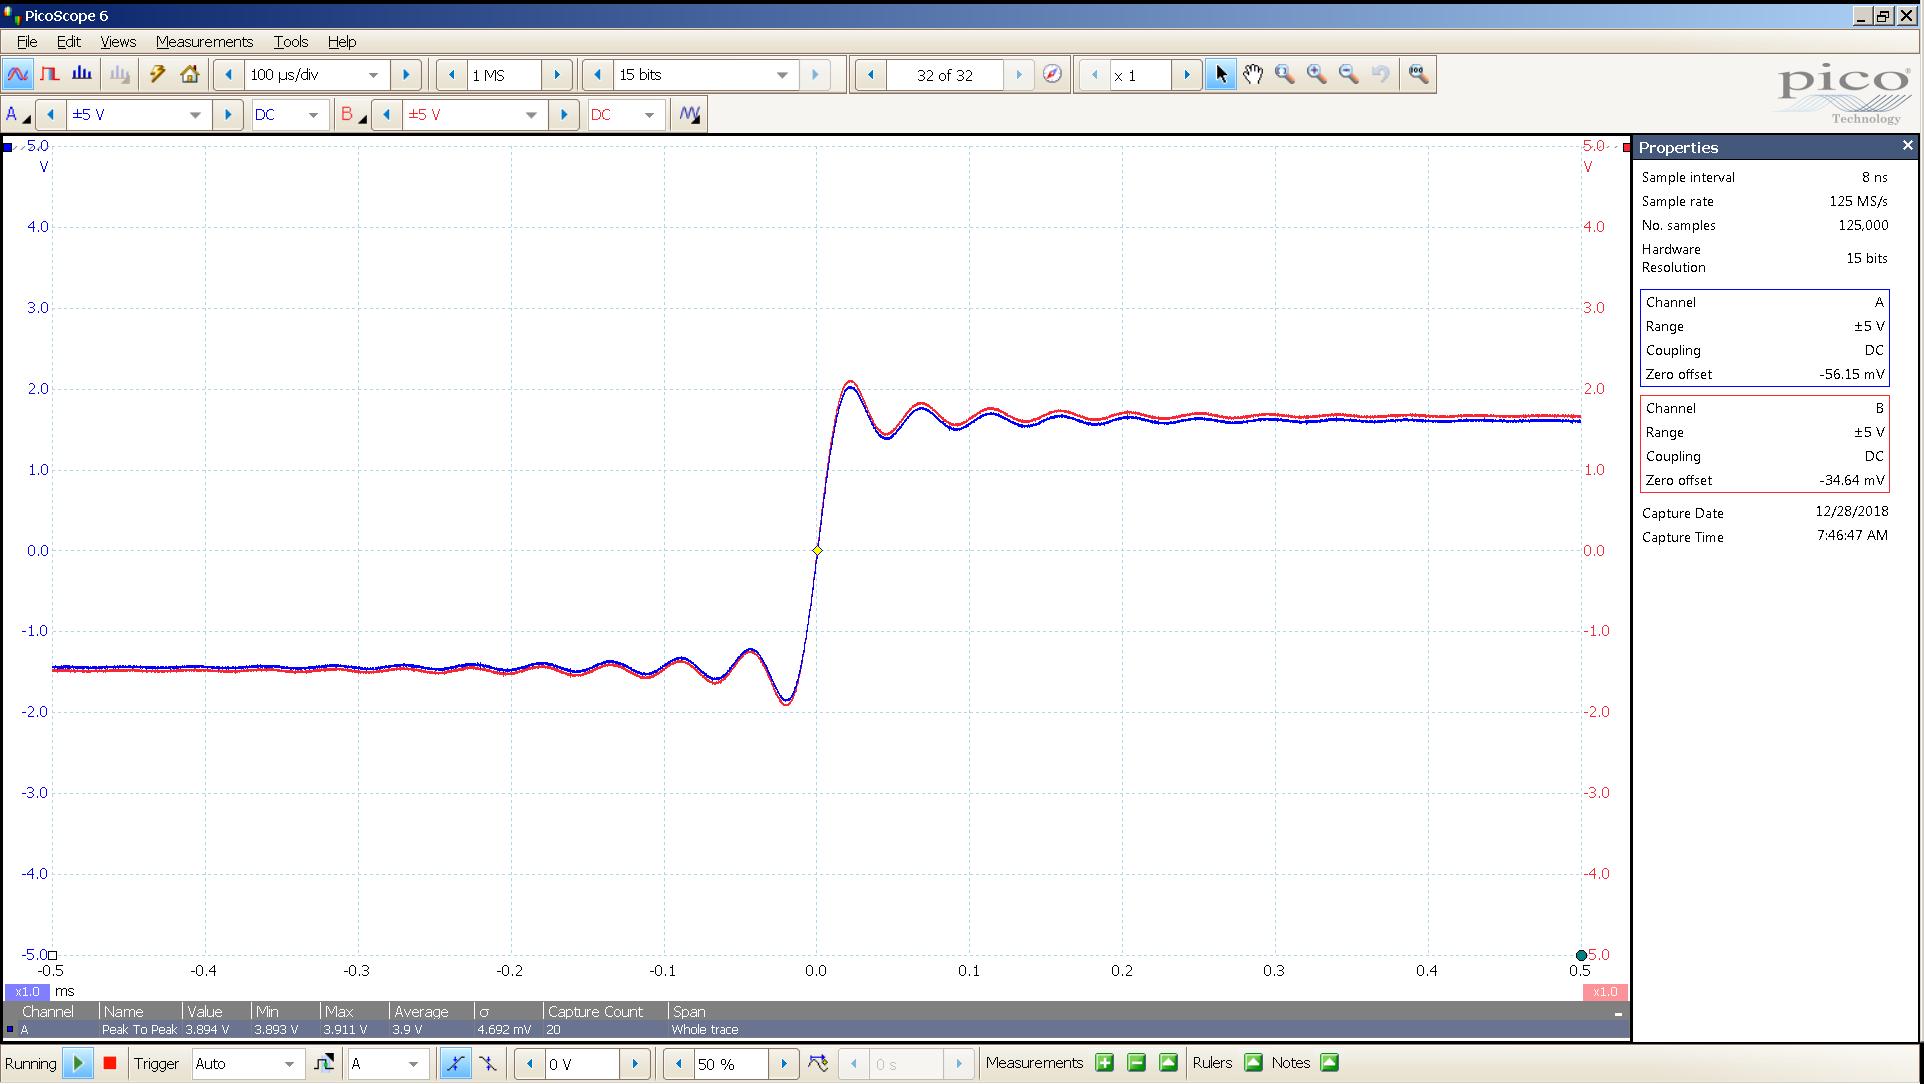 20181227-22 convert2 Bal 20 Hz sqr 0 dBFS 4 Vpp 100uS div - AES 44K.PNG